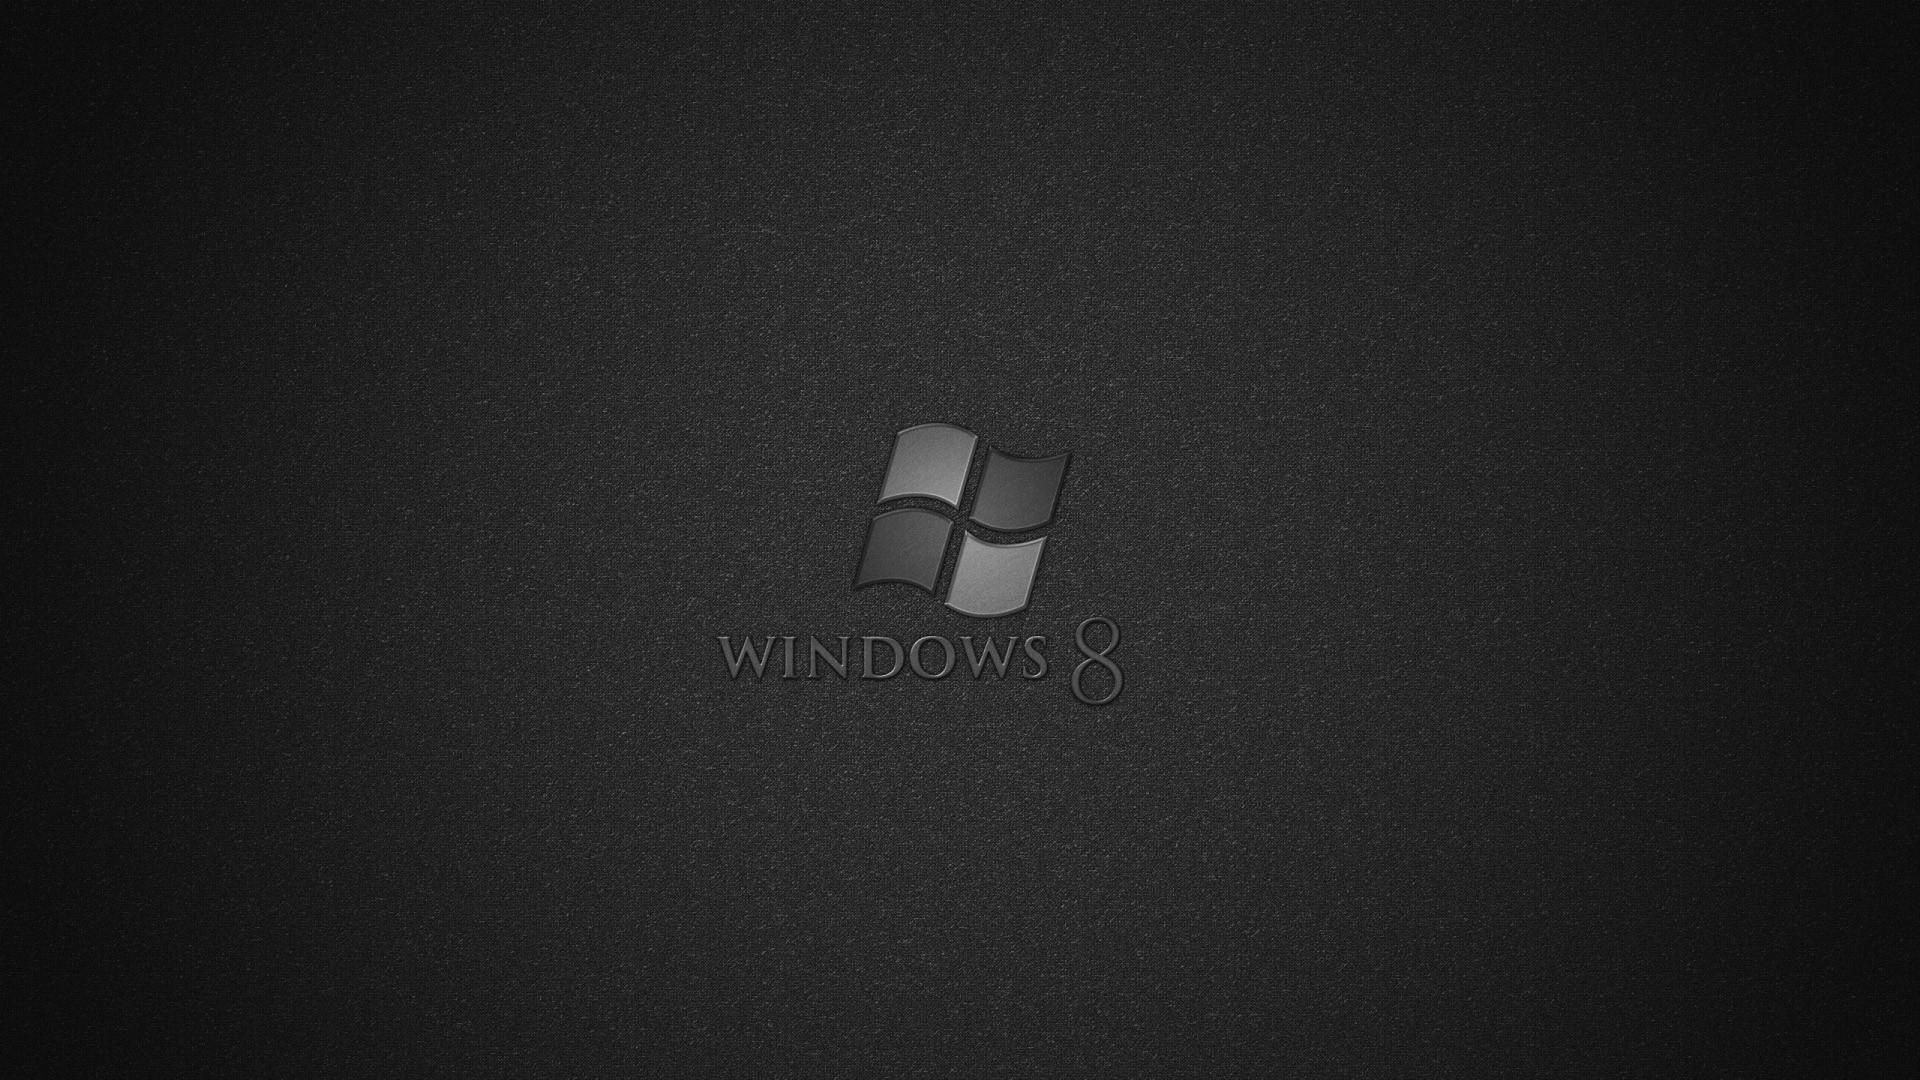 Black Windows Wallpaper 1080p: Black HD Wallpapers 1080p